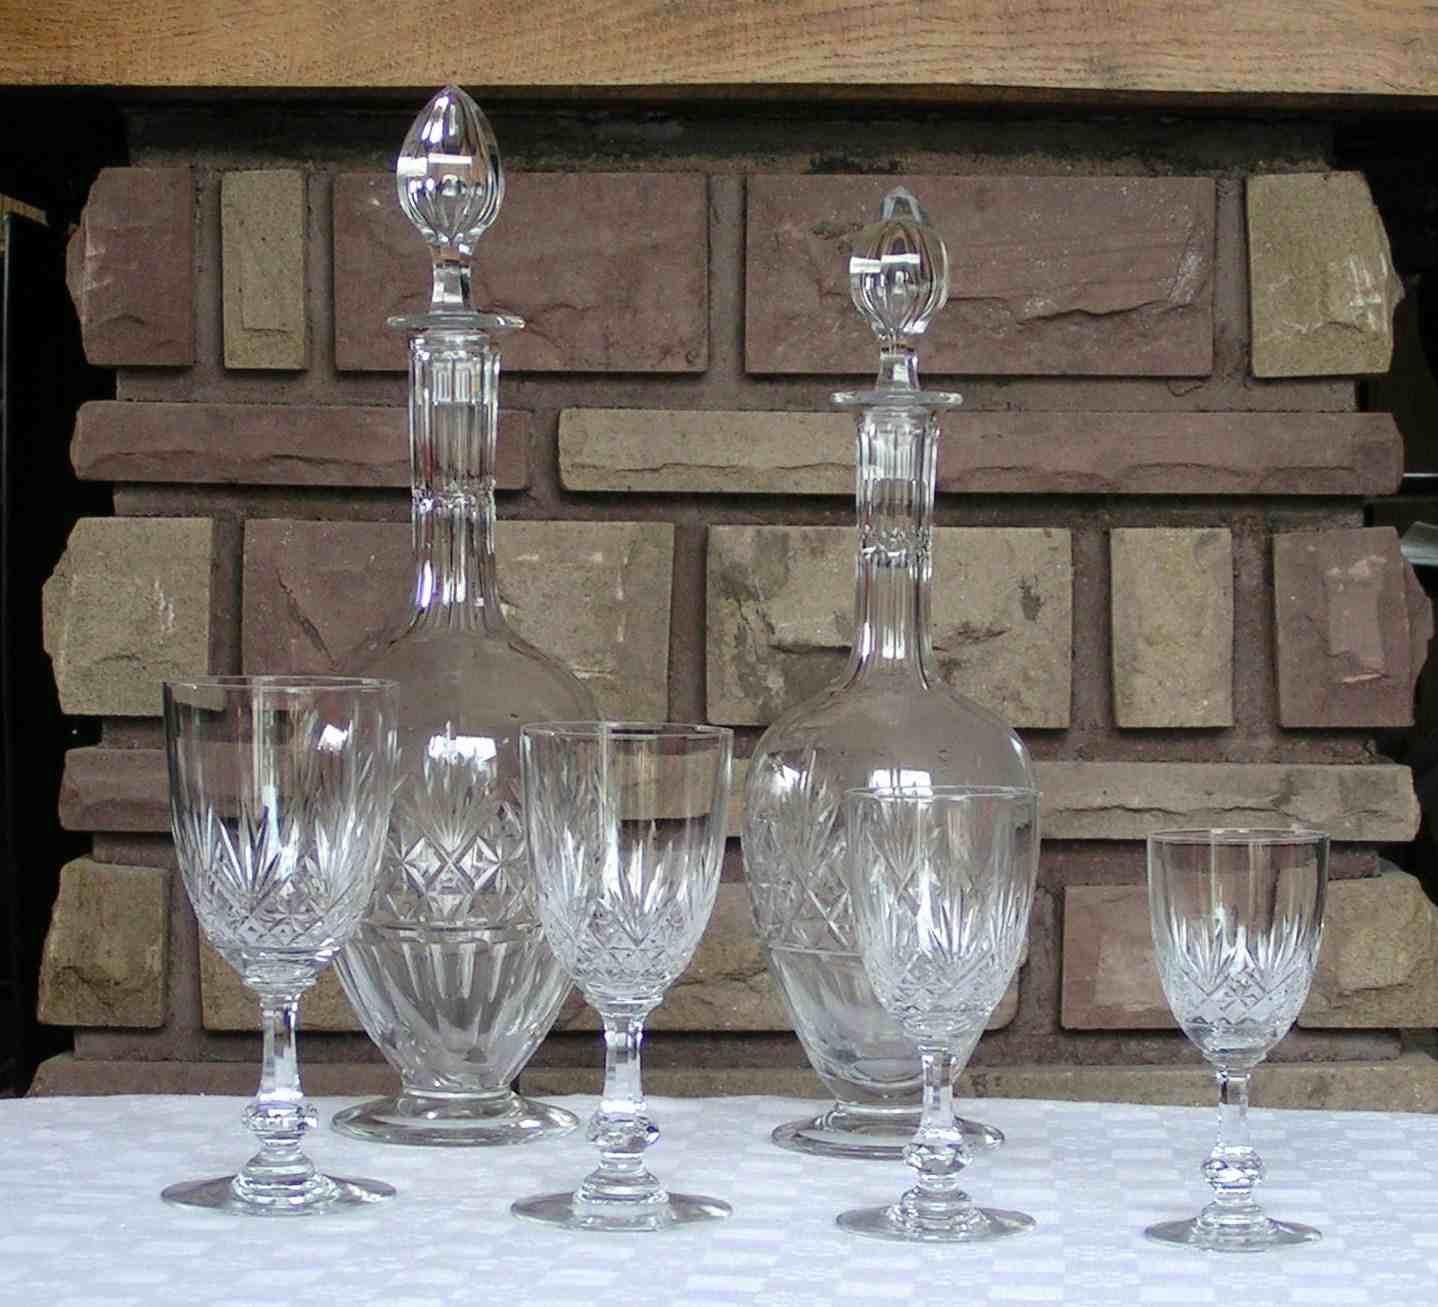 Verres cristal de SaintLouis service Massenet